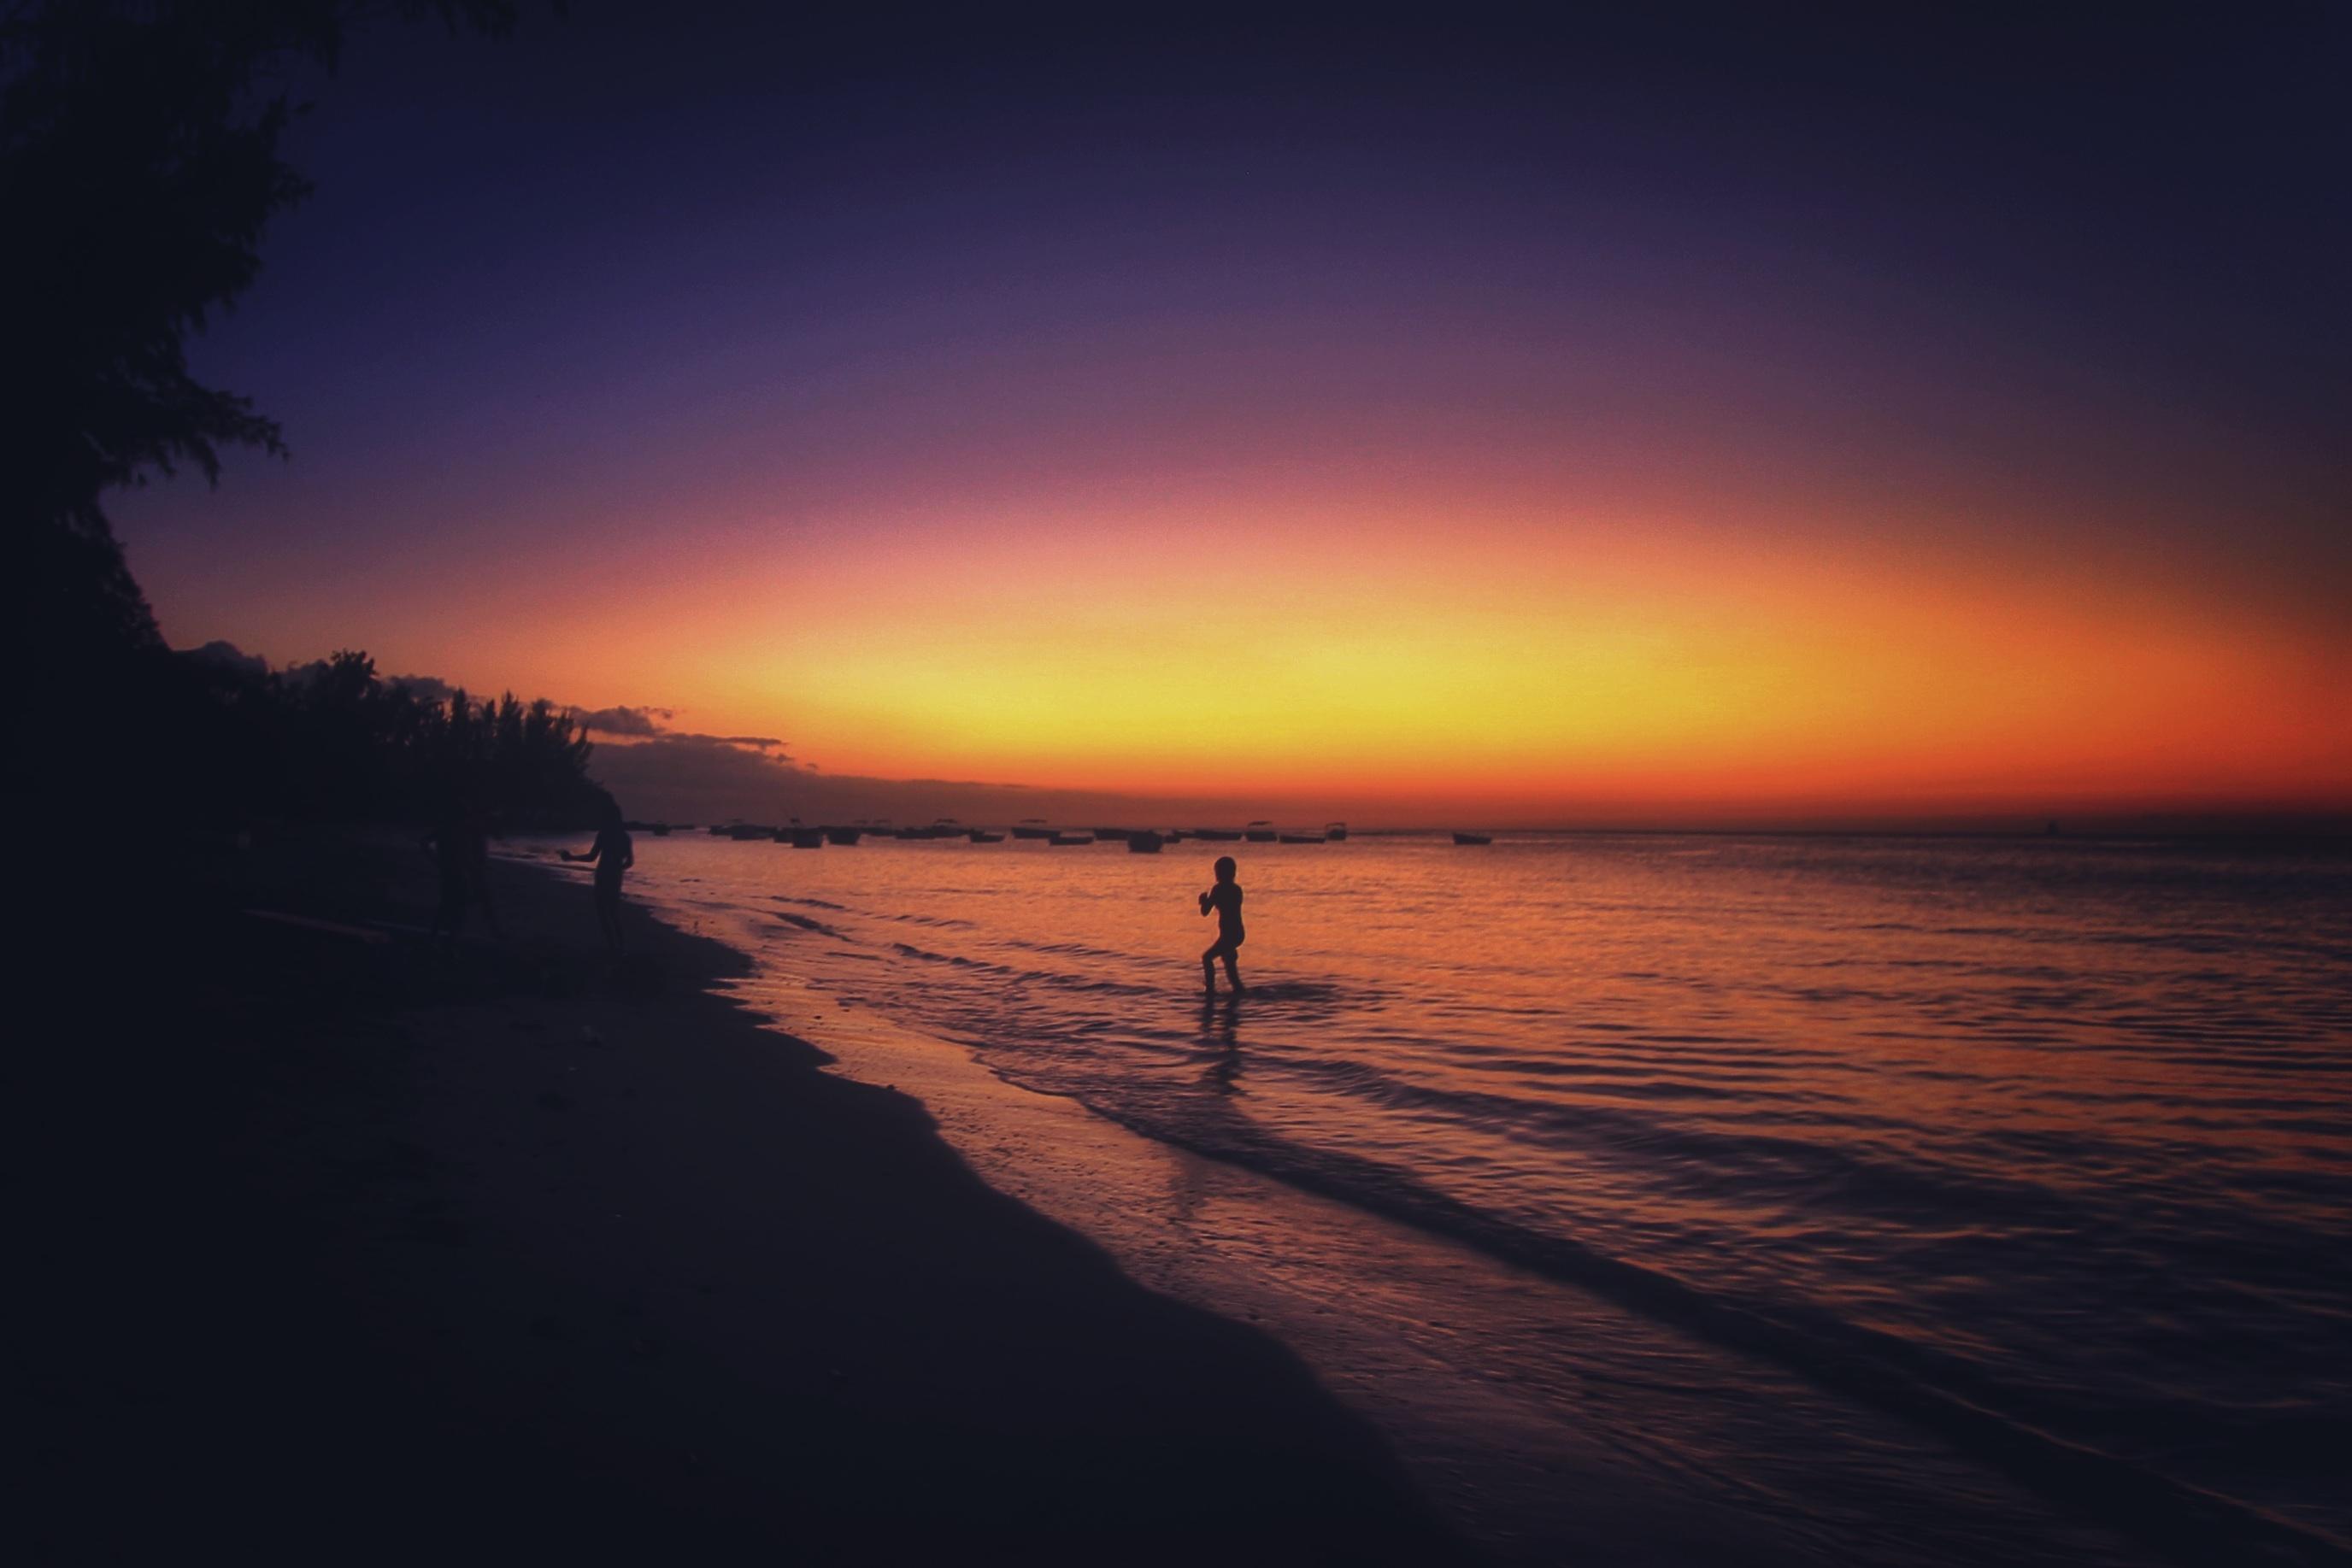 The Sunset, Activity, Beach, Dark, Flow, HQ Photo